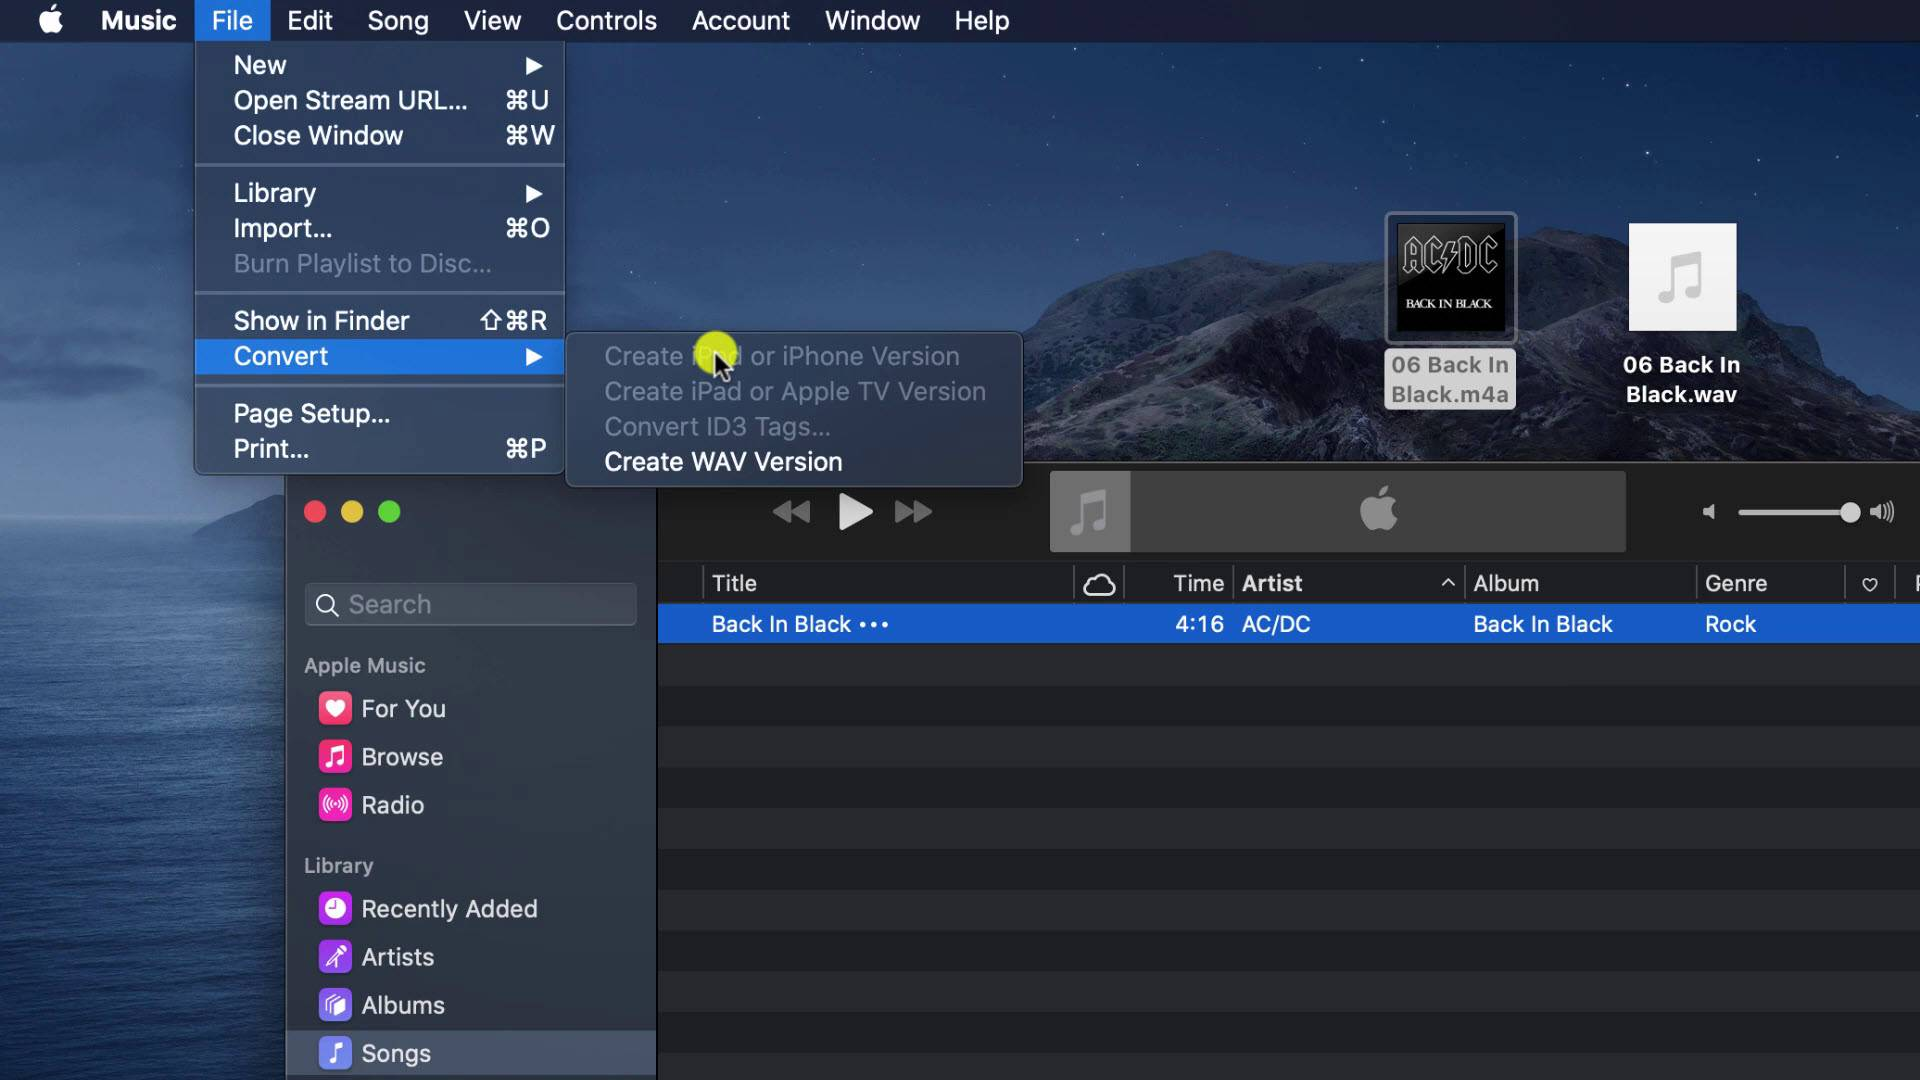 The create a wav version menu option in apple music